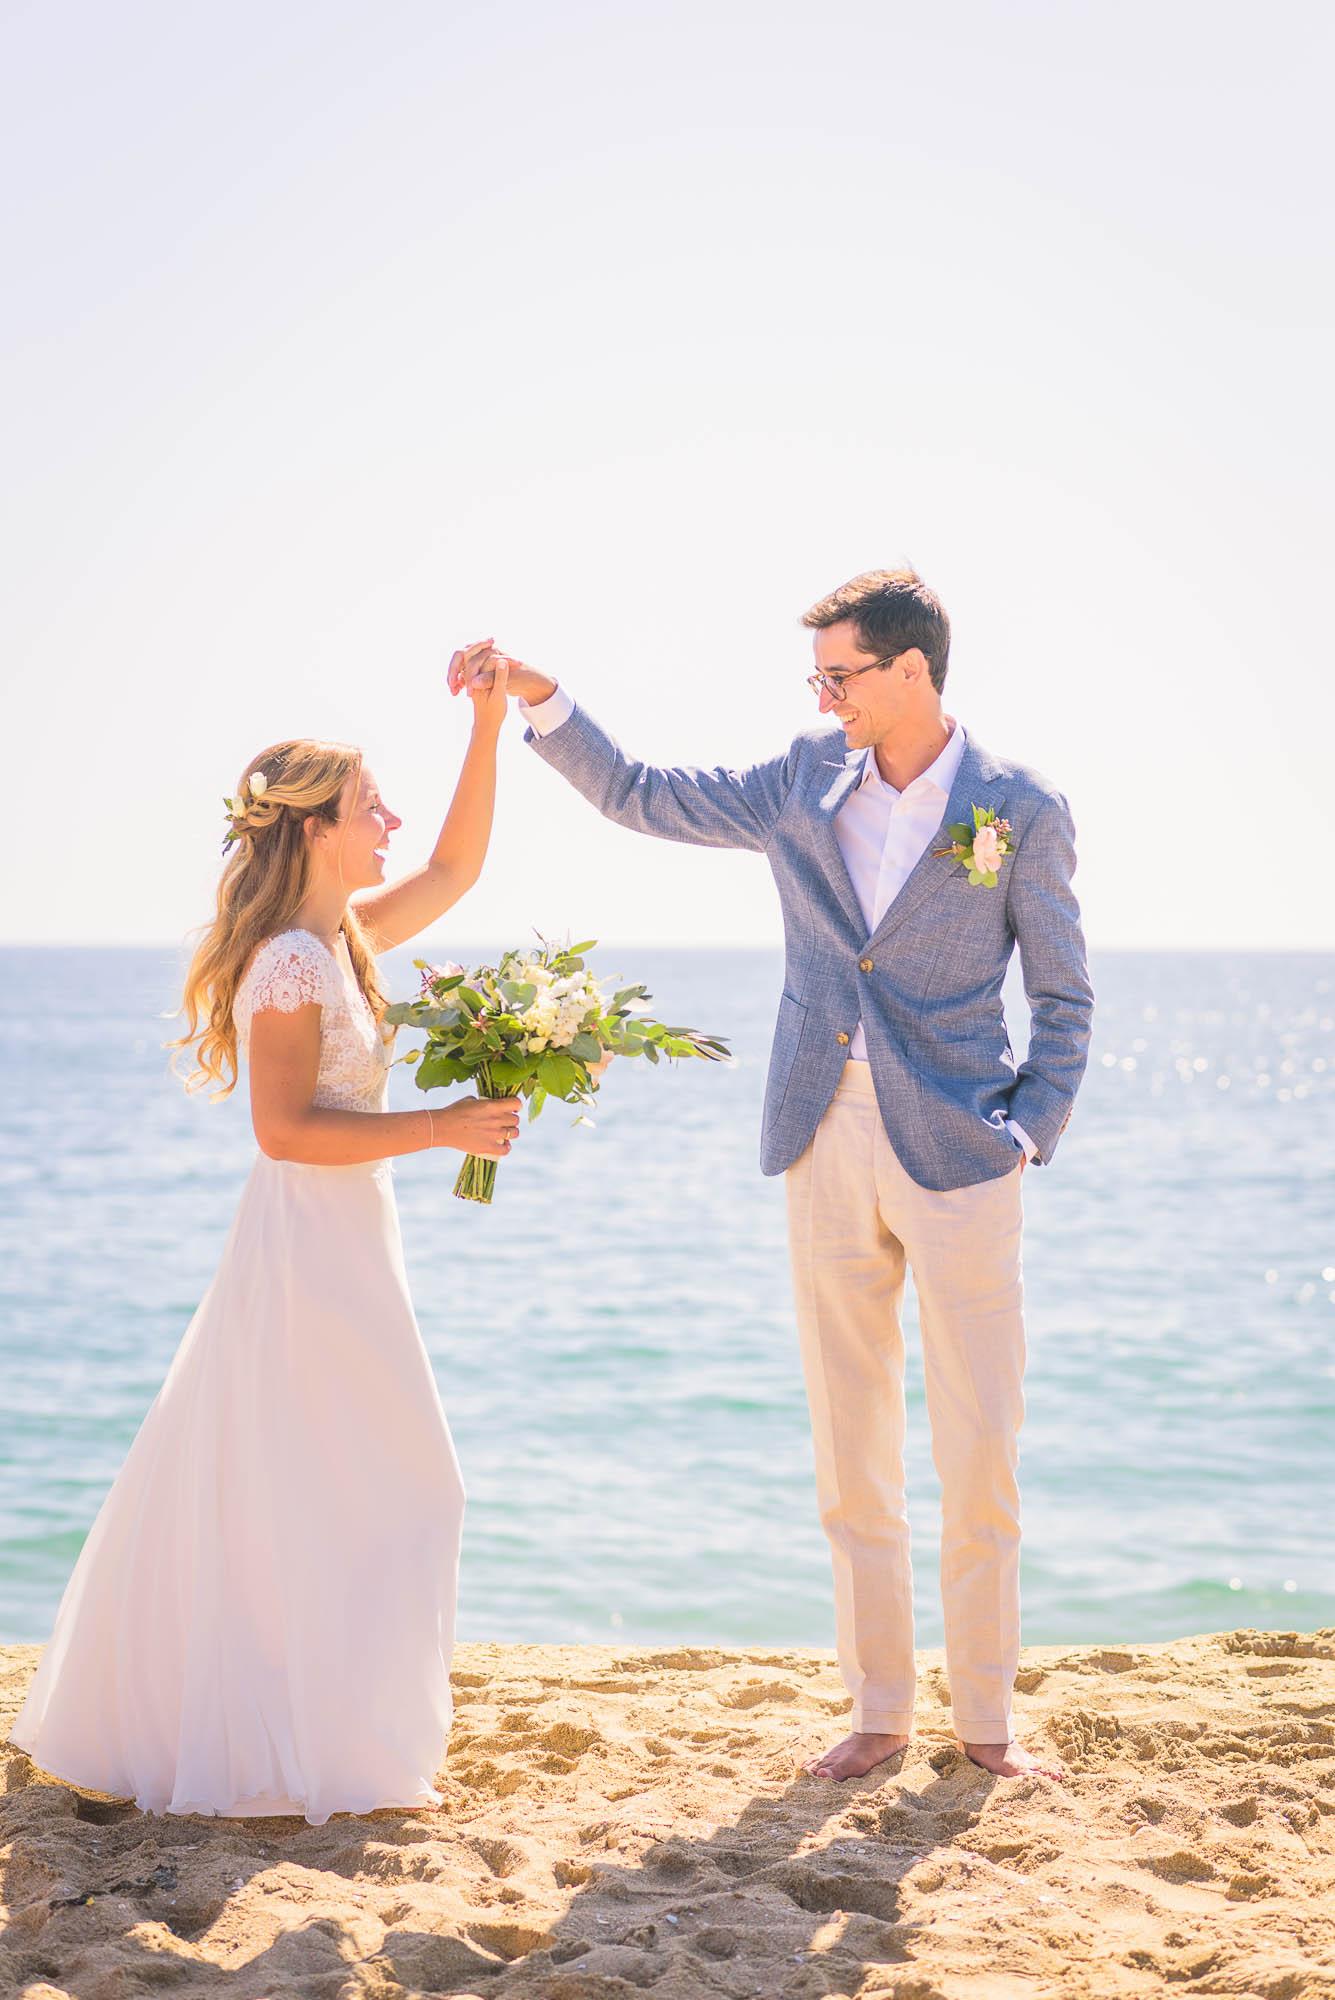 037_Alan_and_Heidi_Wedding_Verena_Andreas